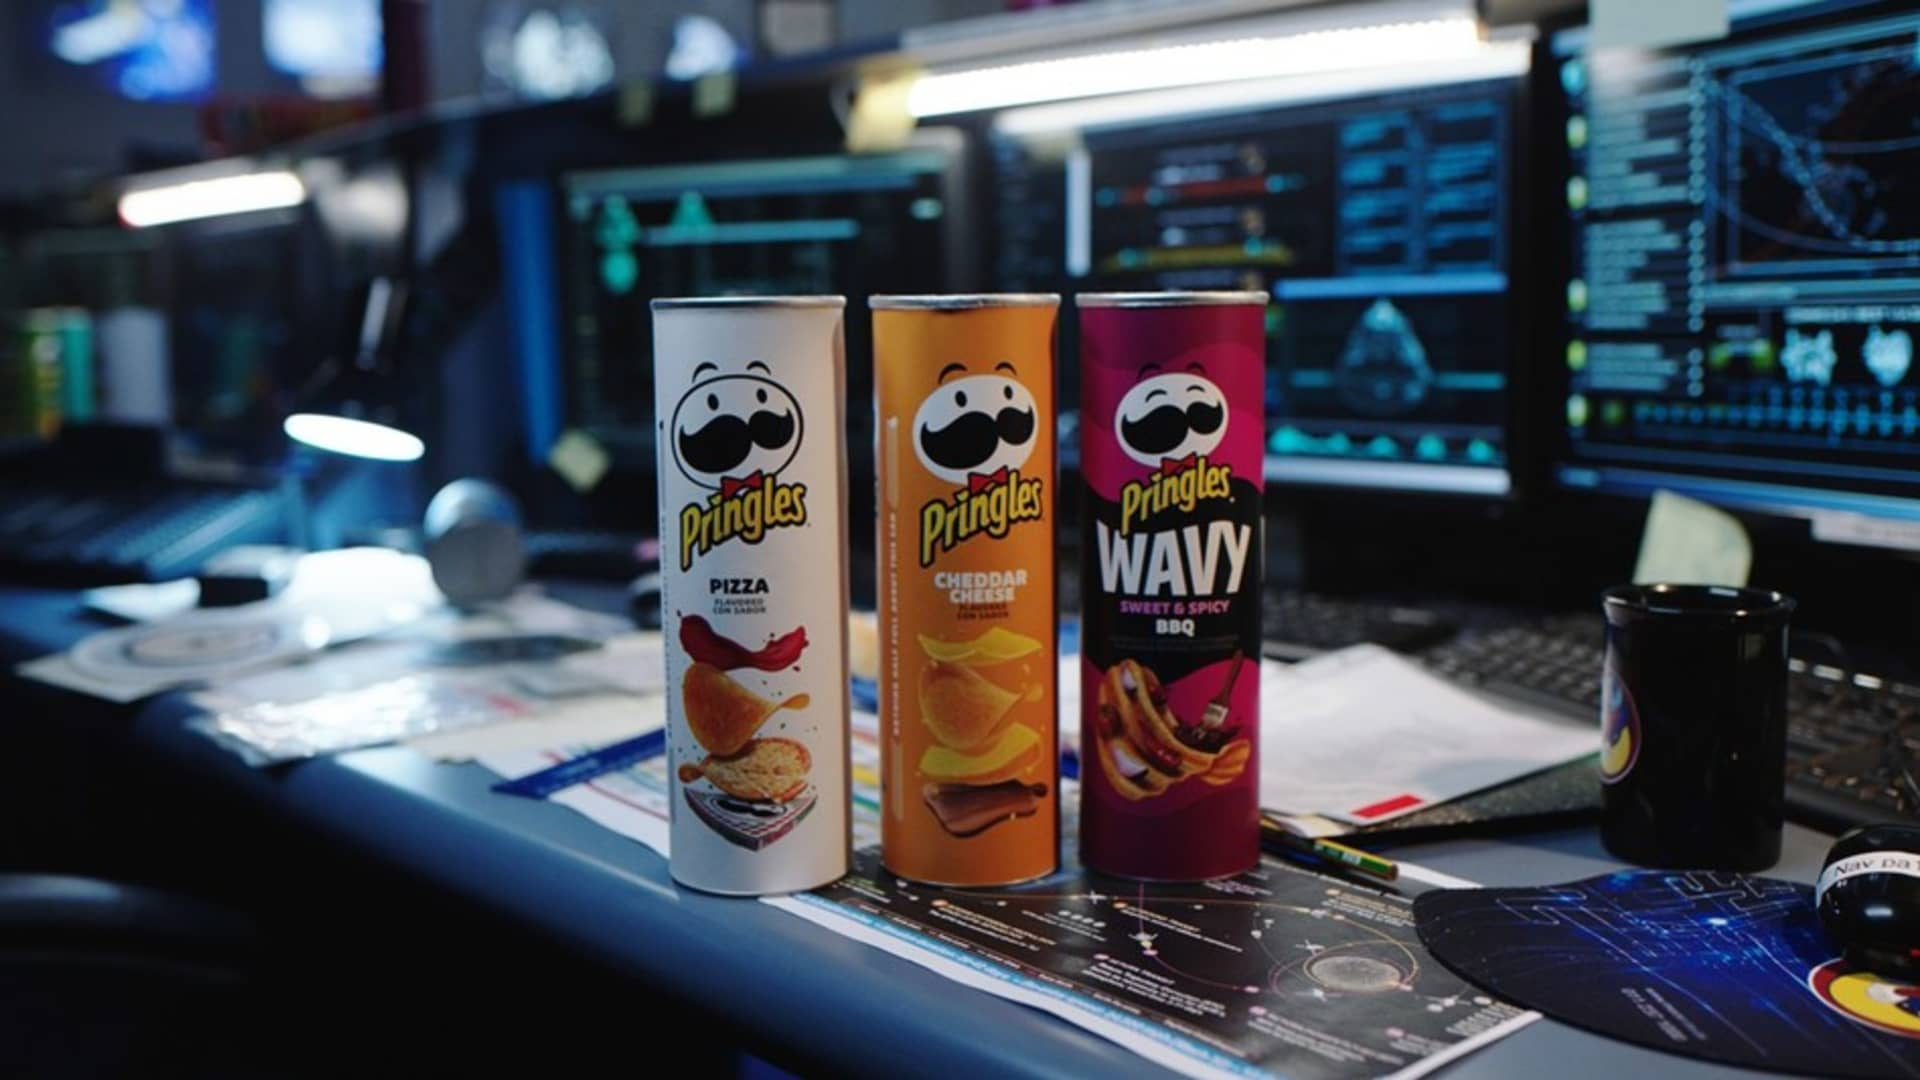 Pringles tubes for the brand's Super Bowl 2021 ad.